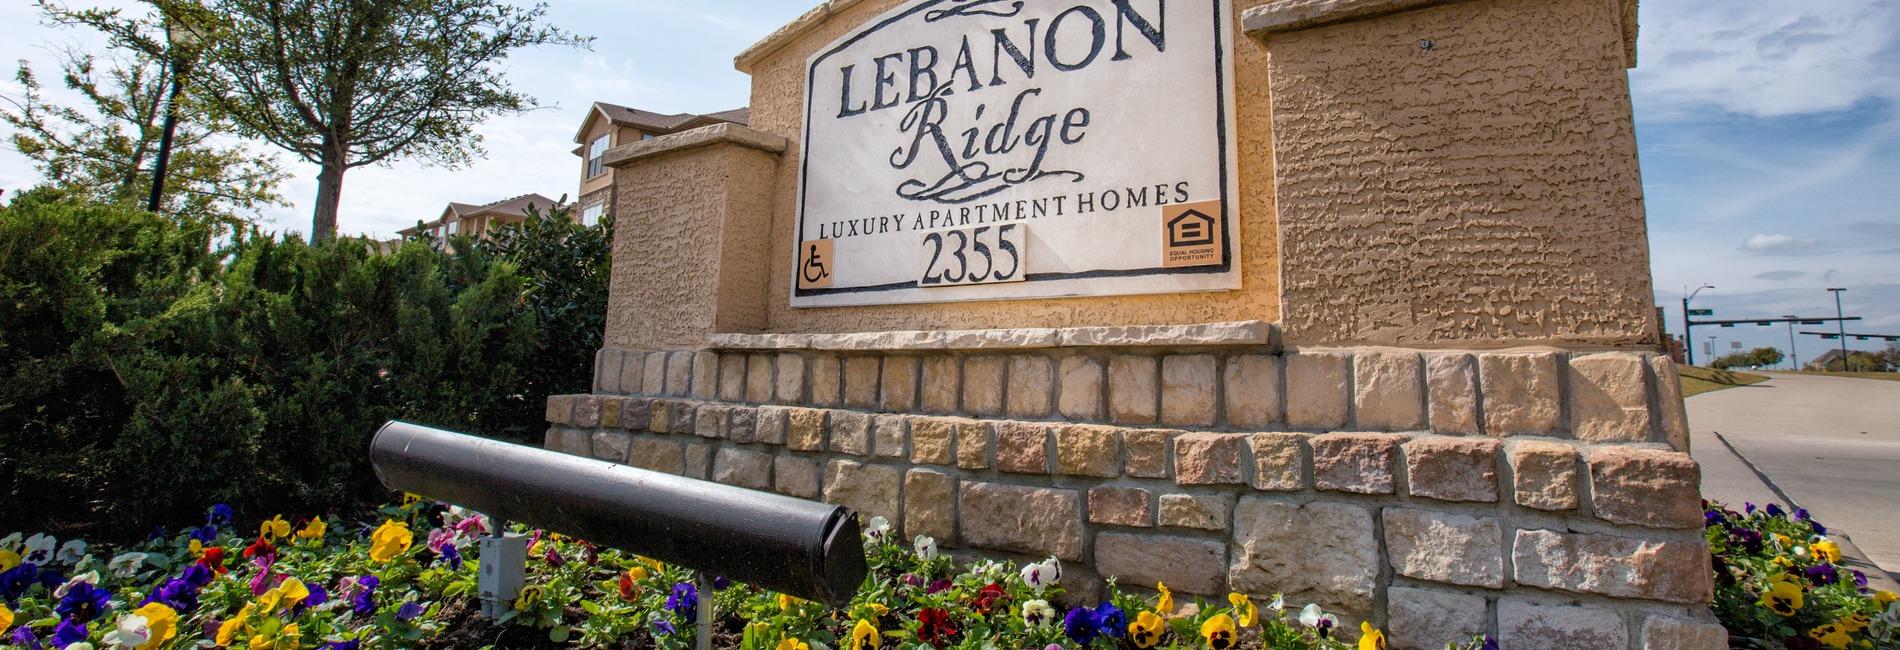 Lebanon Ridge Apartments 2355 Lebanon Rd Frisco Tx